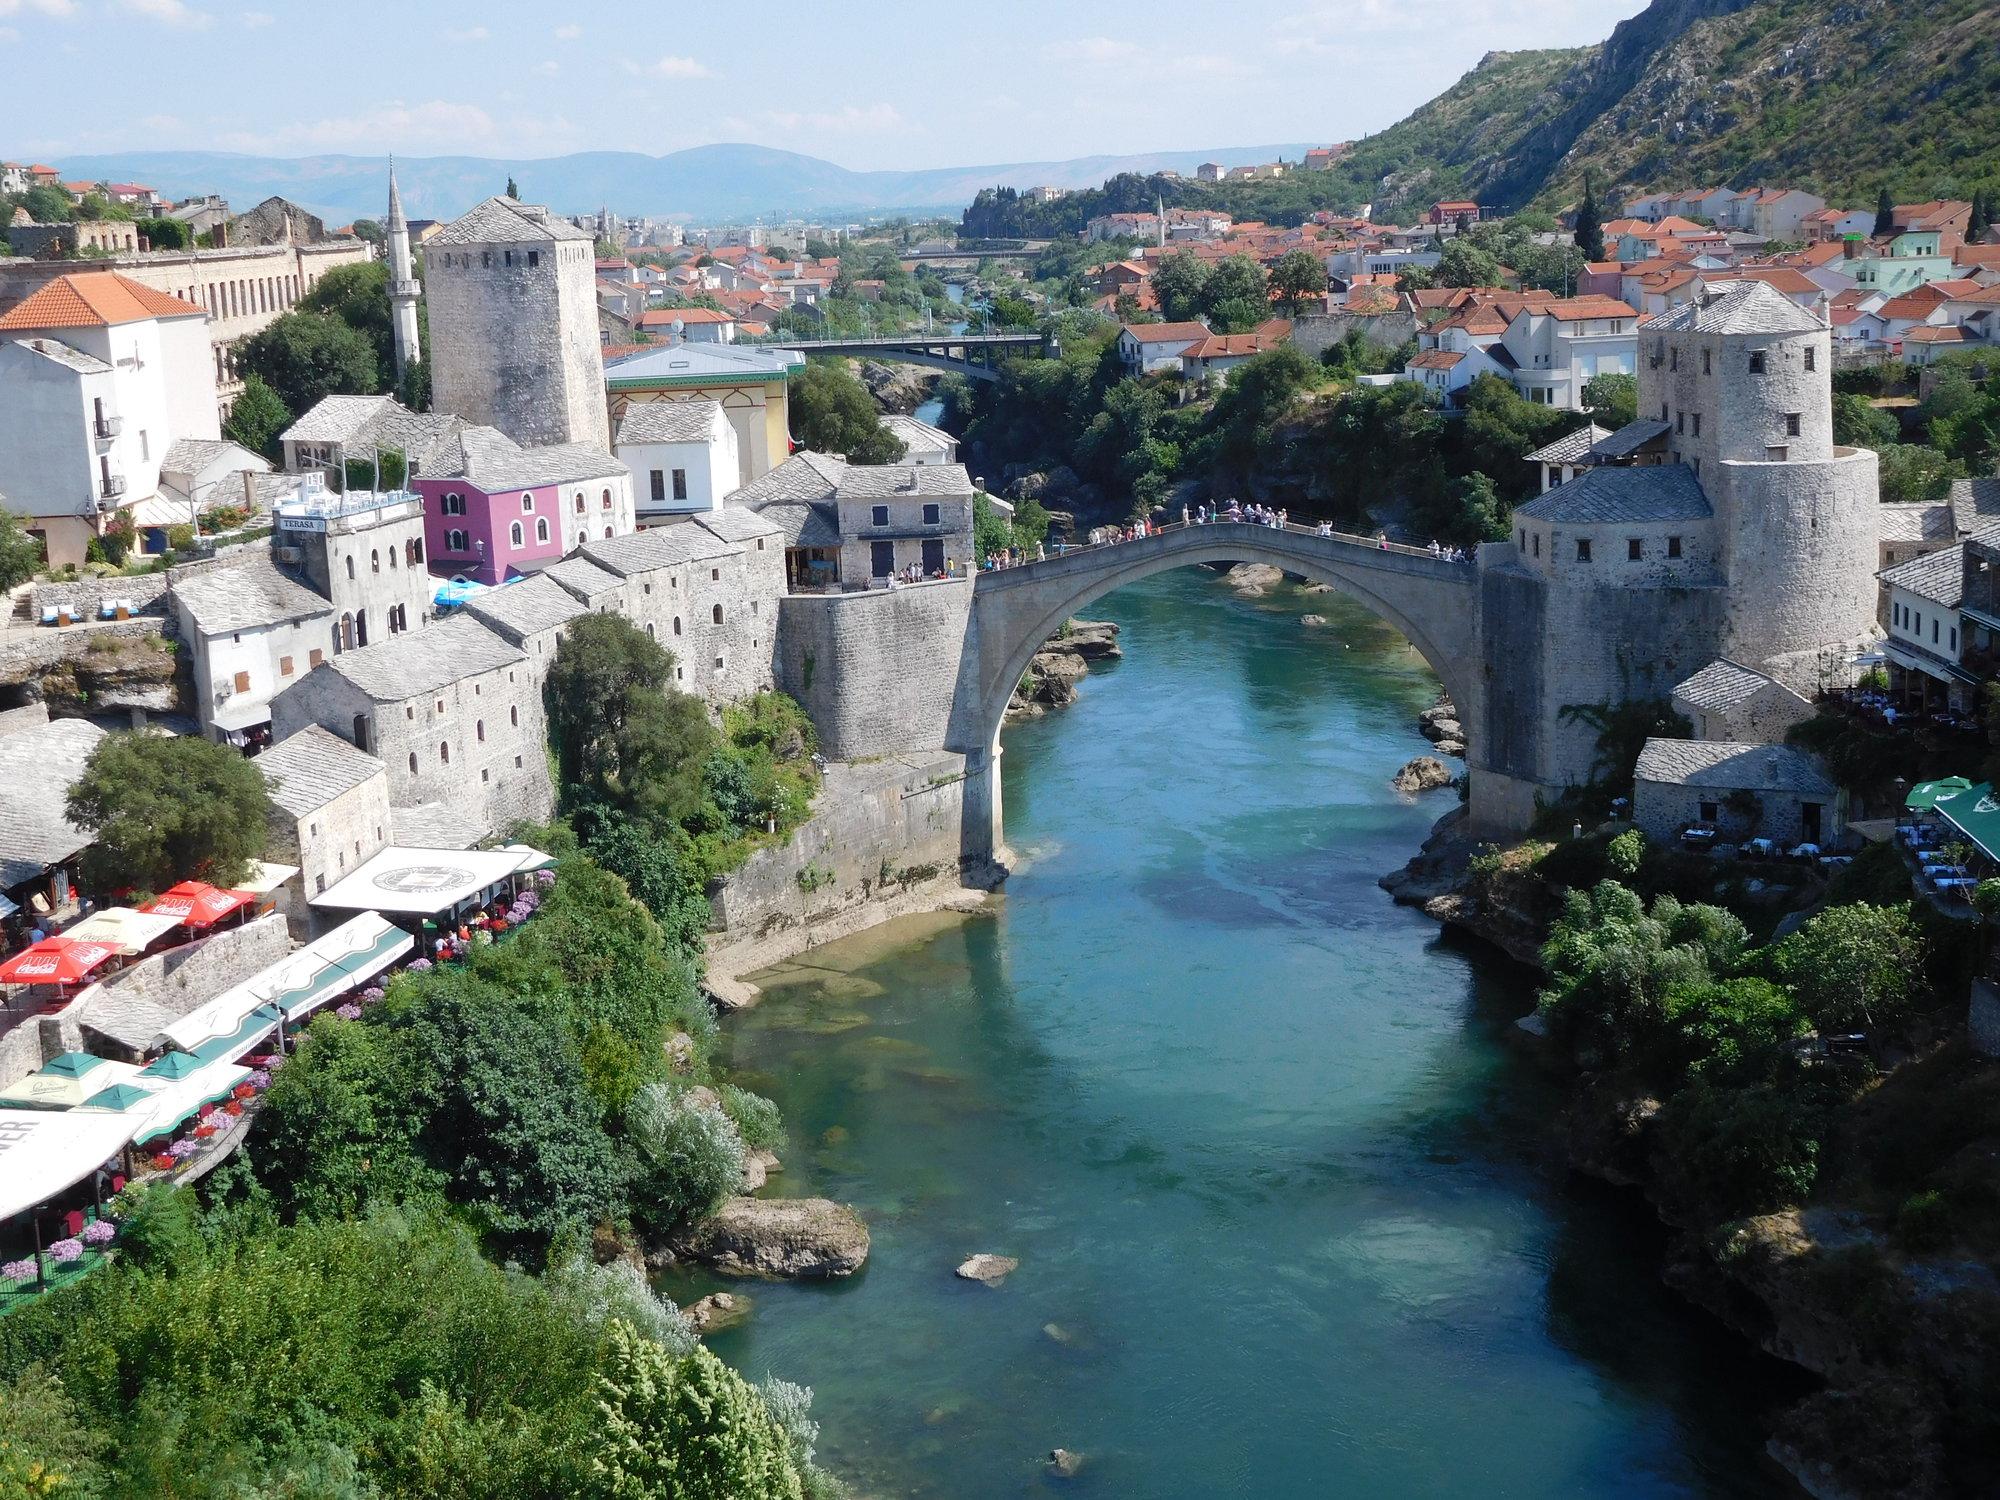 вид из Мечети Коски Мехмед-паши, Старый мост и реку Неретву